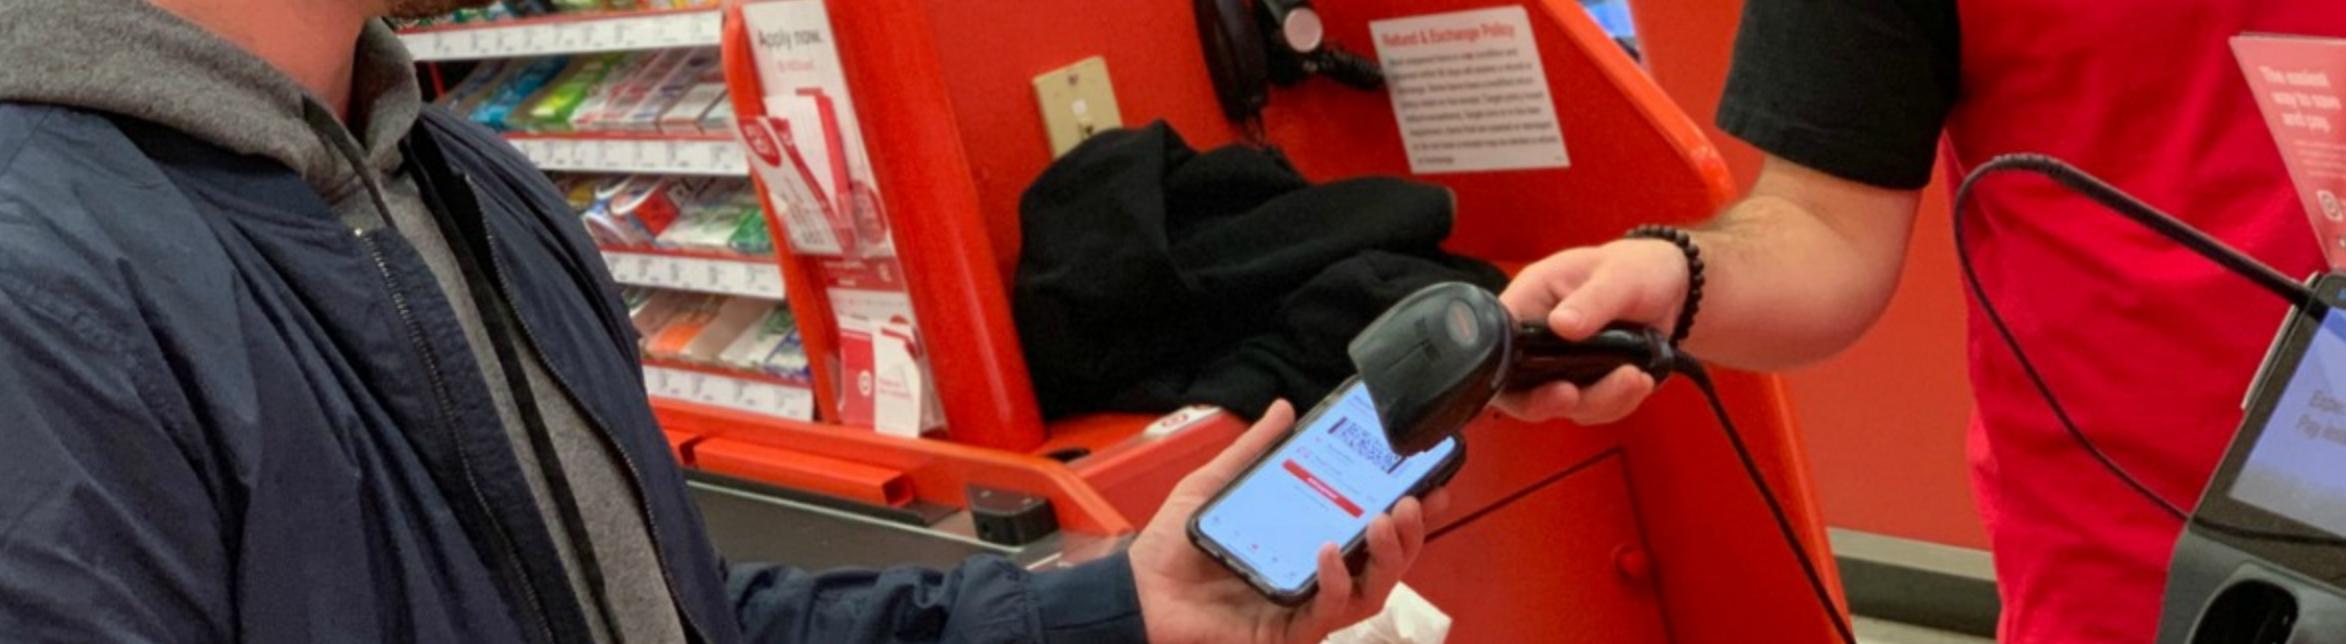 scanning Target circle offer on phone